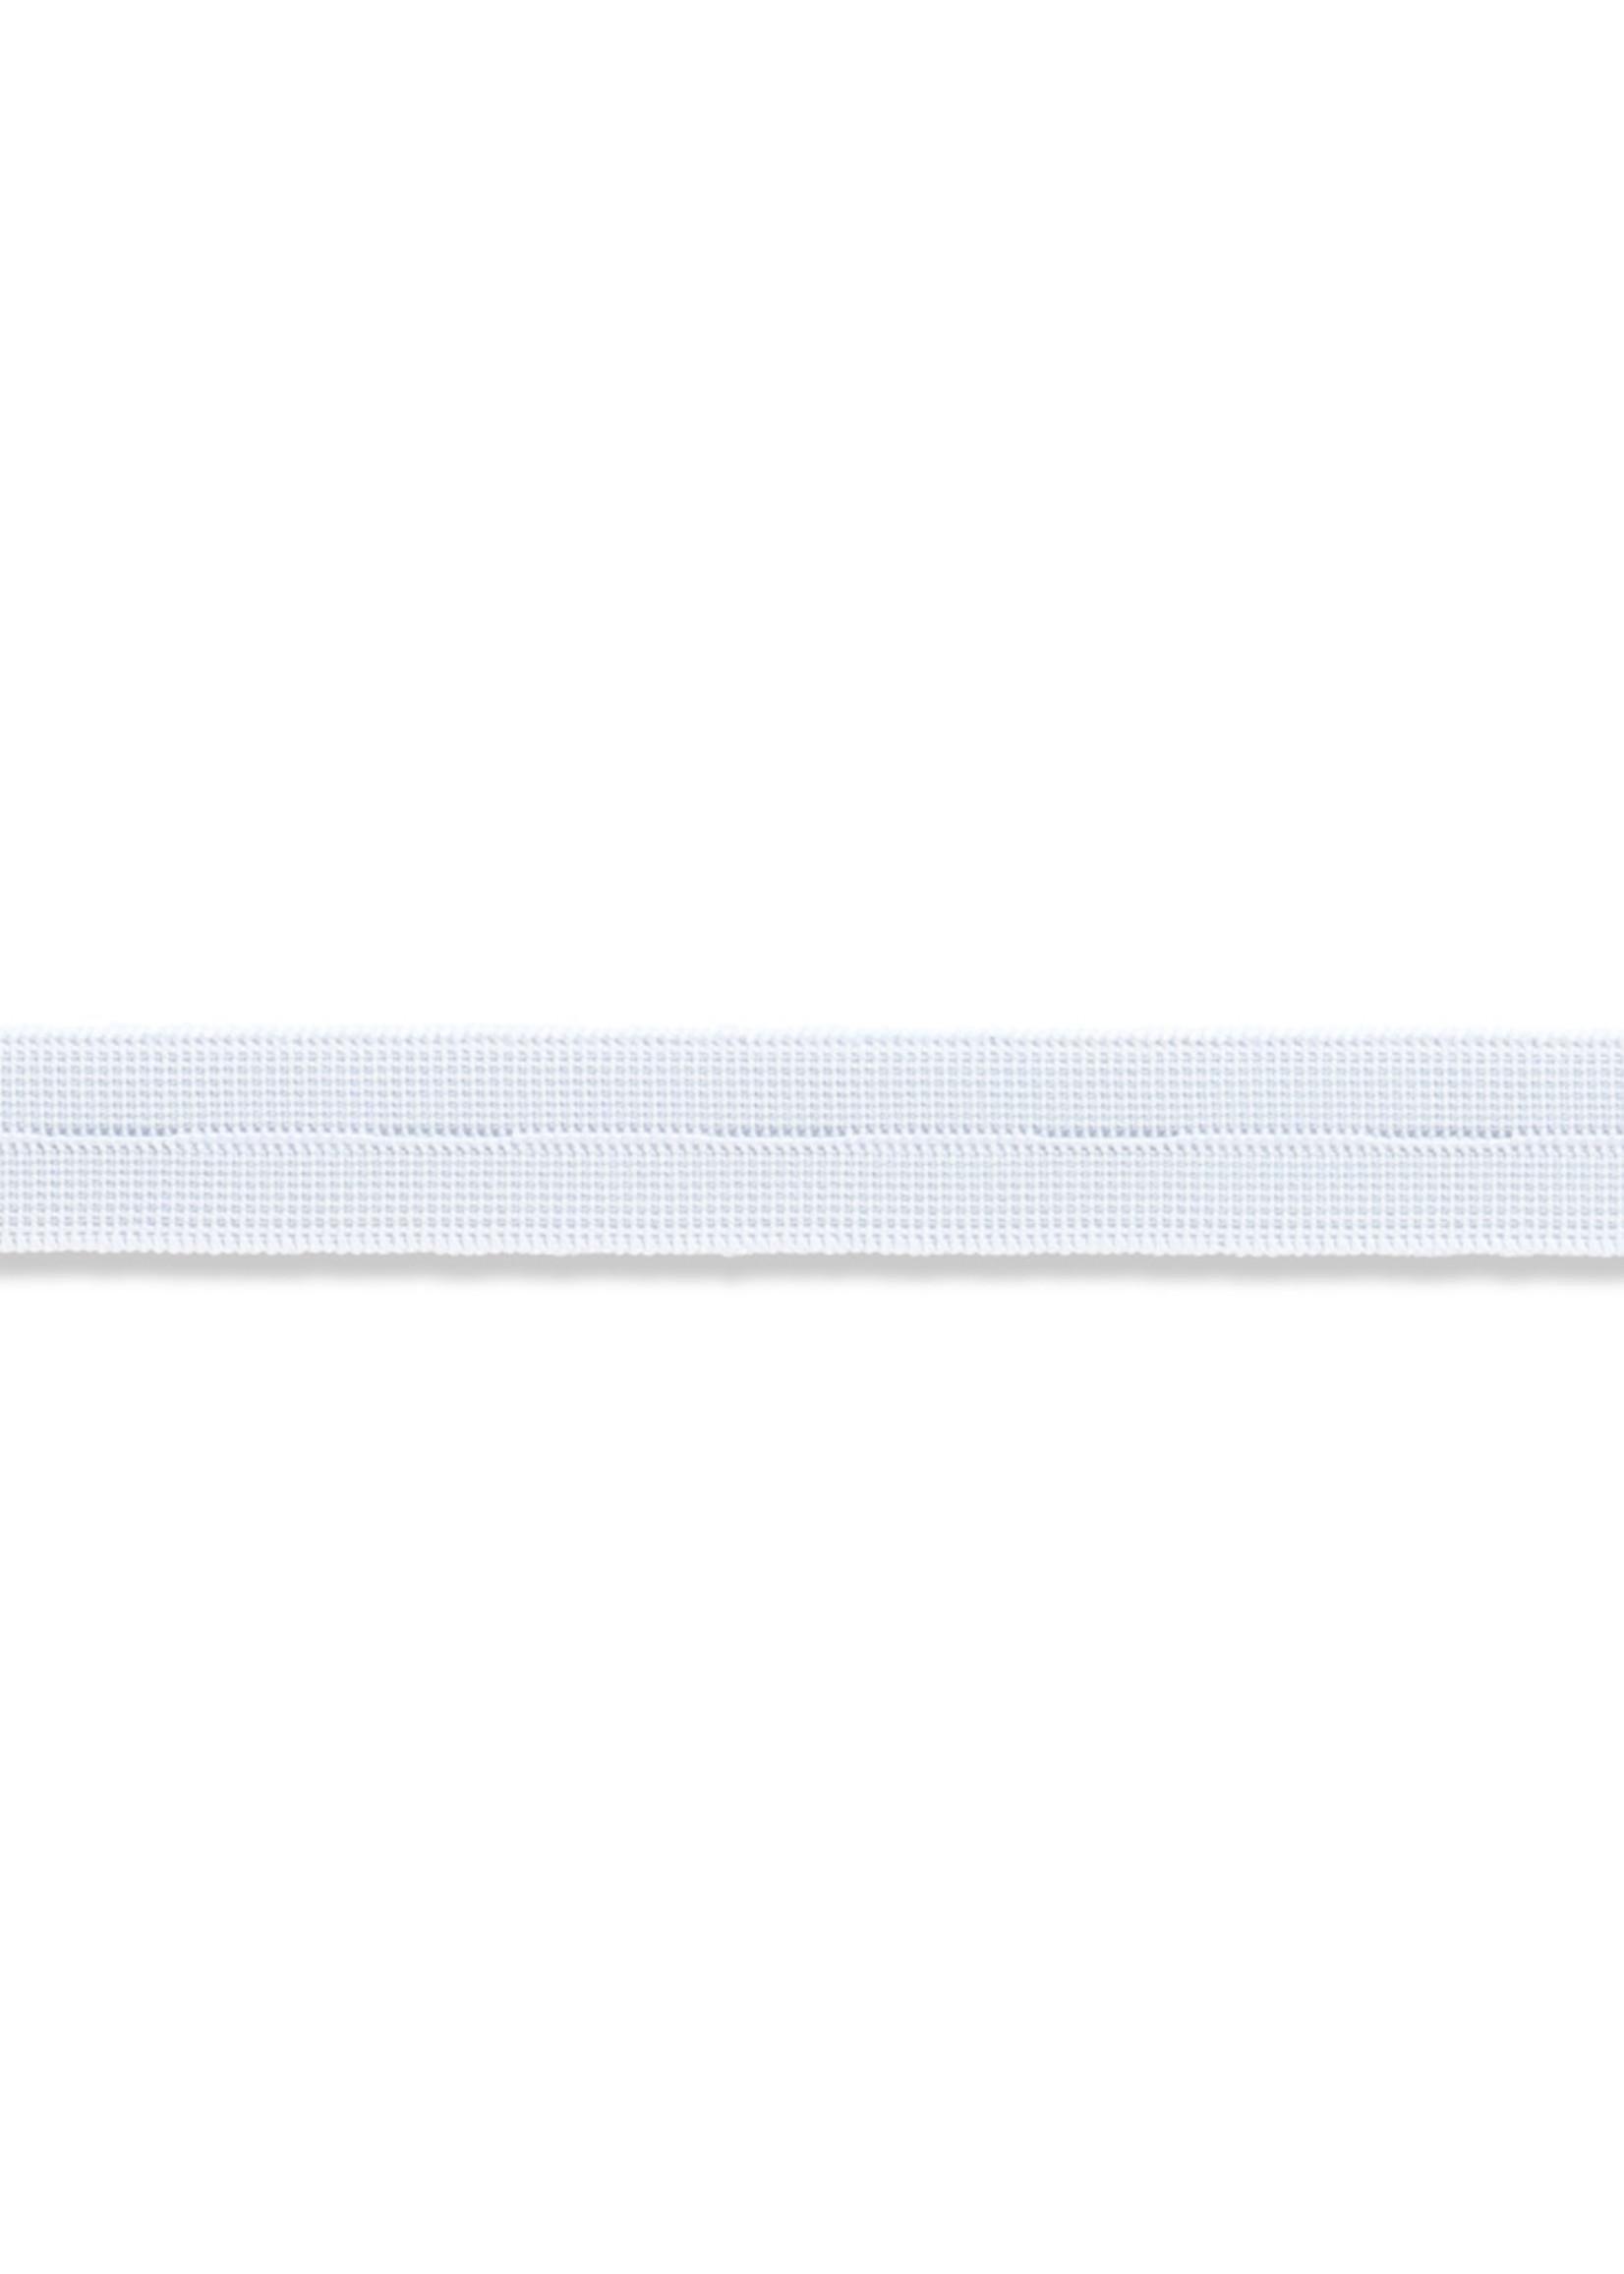 Prym 956041 KNOOPSGATENELASTIEK 18mm WIT